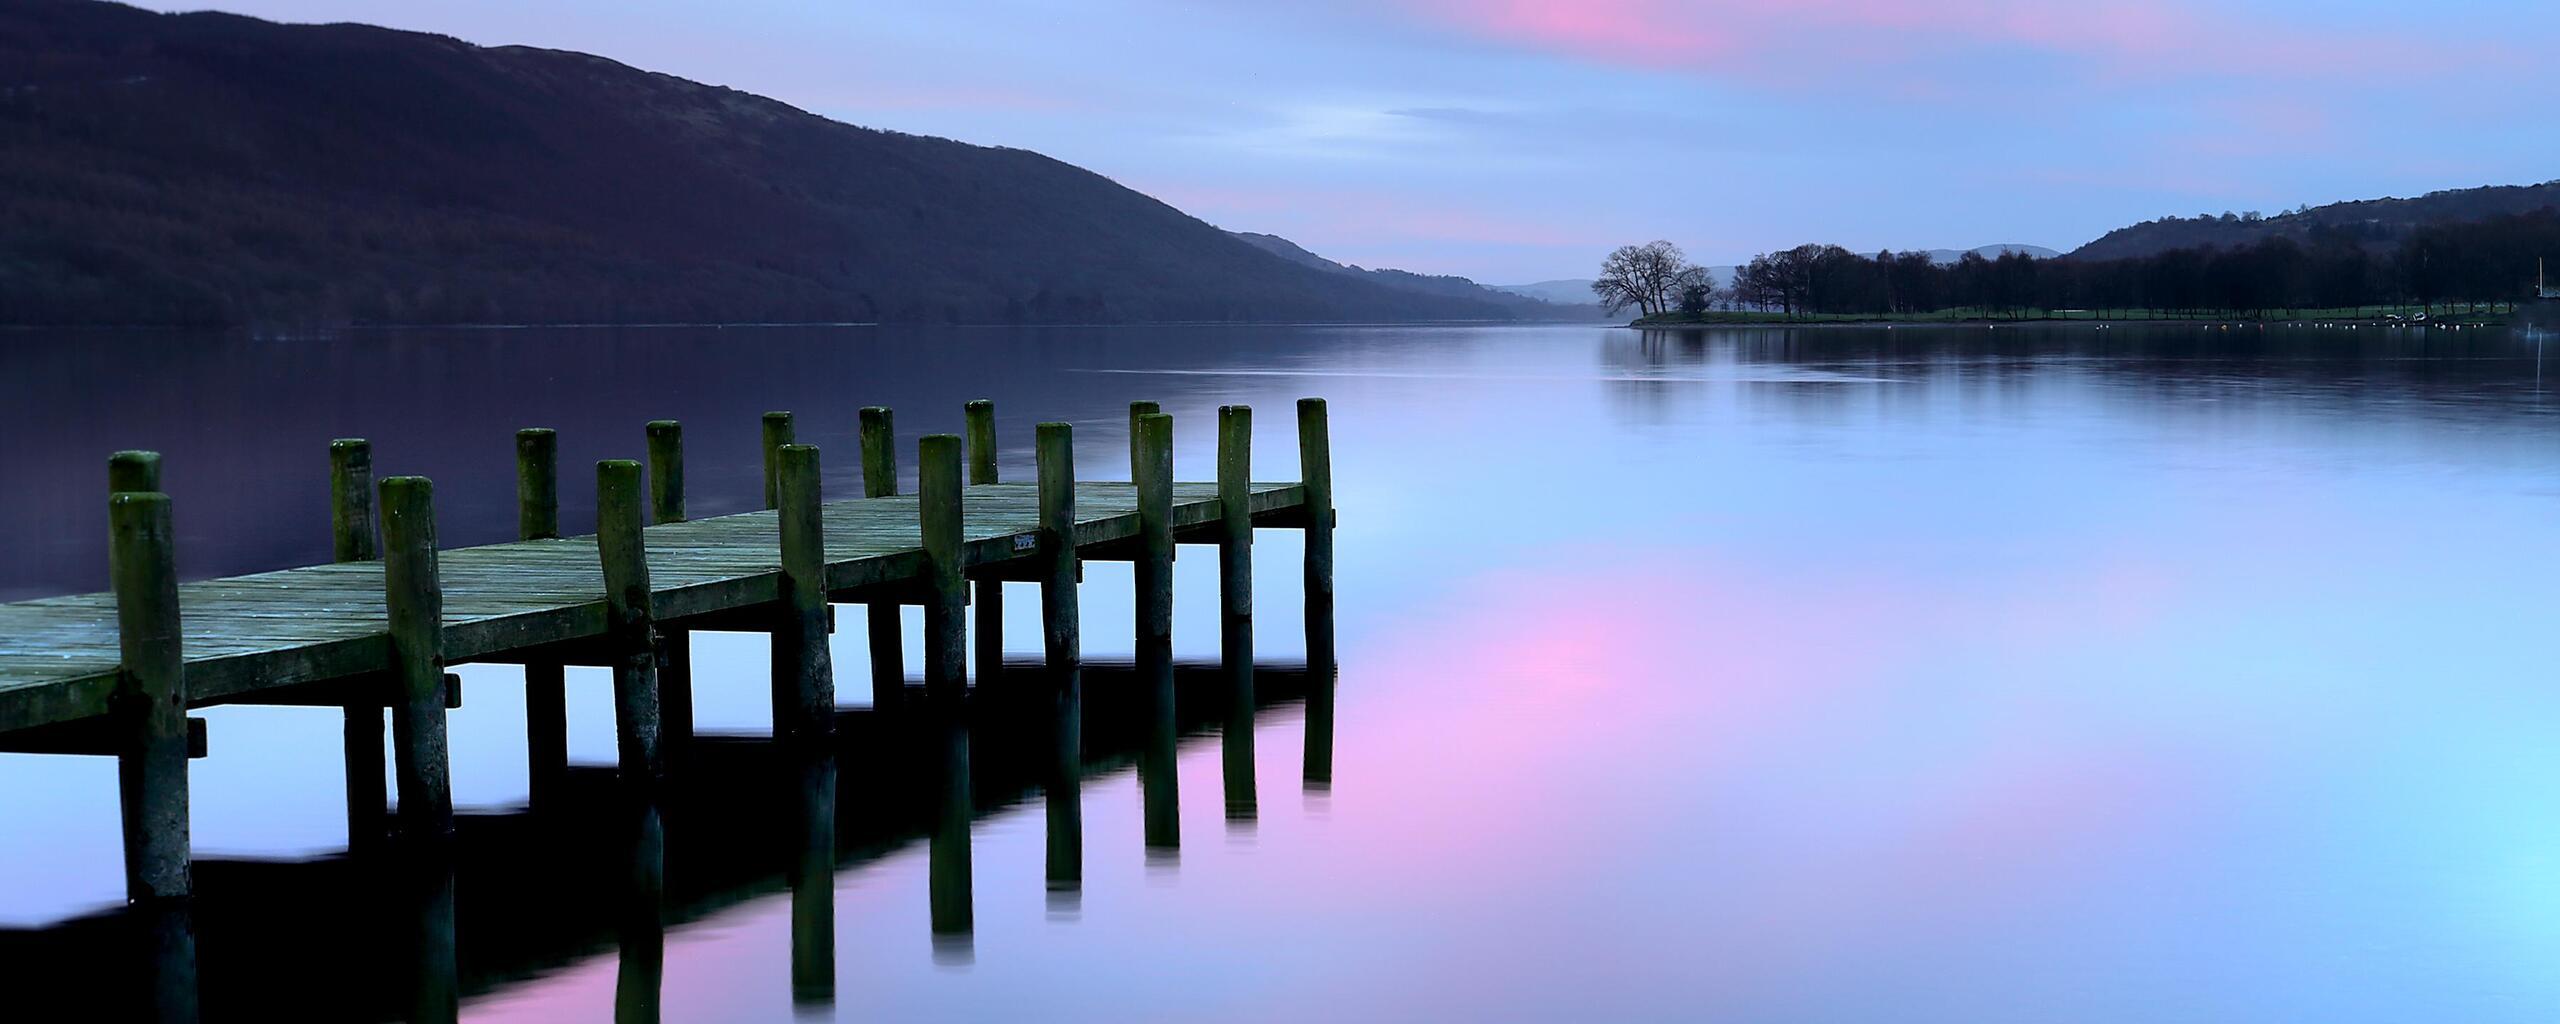 pier-lake-district-evening-4k-1z.jpg